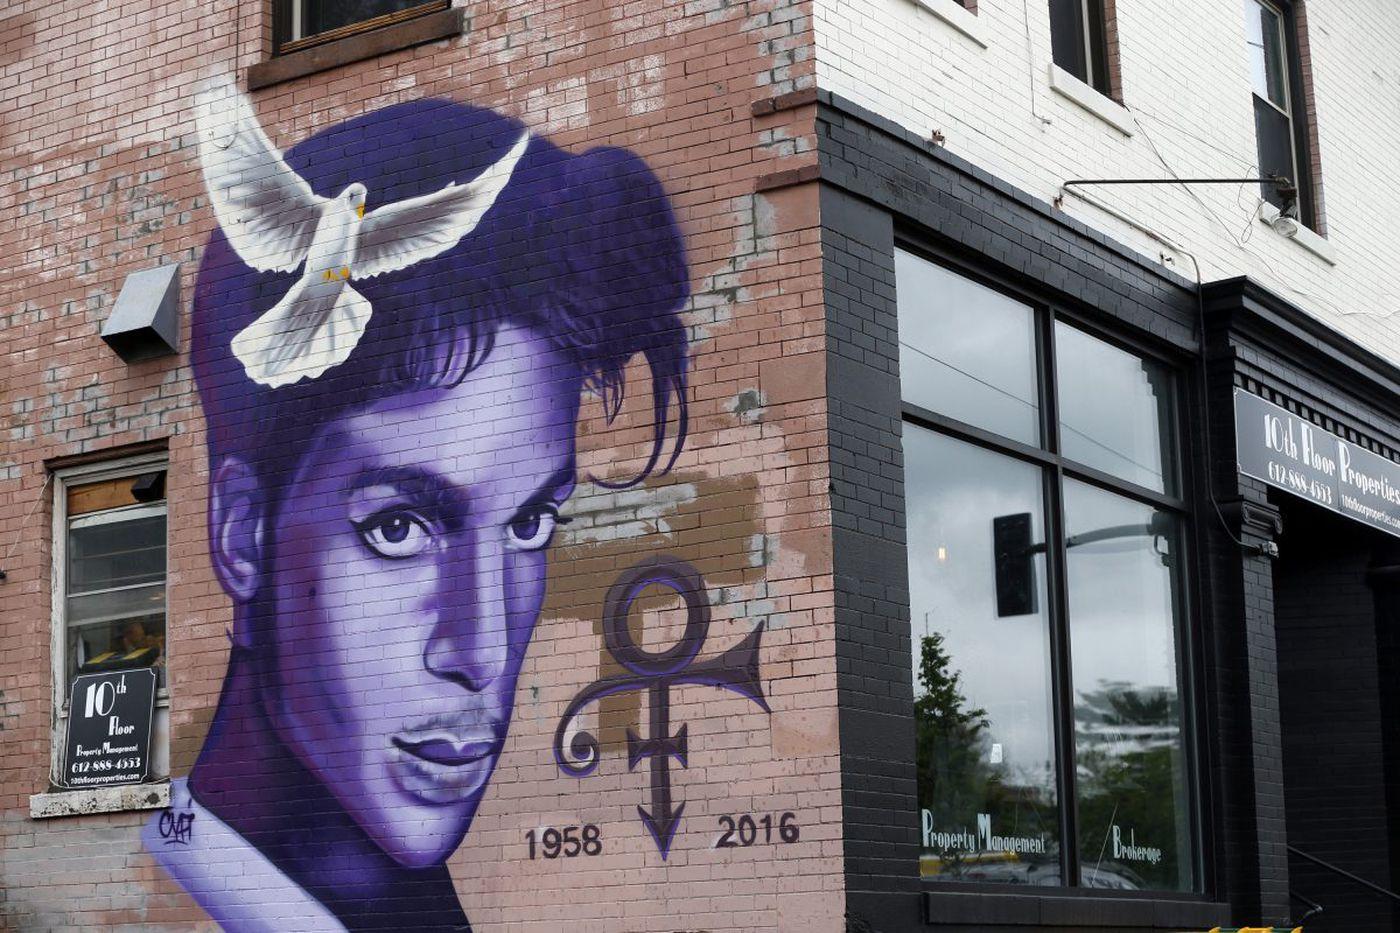 In Minneapolis, Prince still reigns over Super Bowl LII